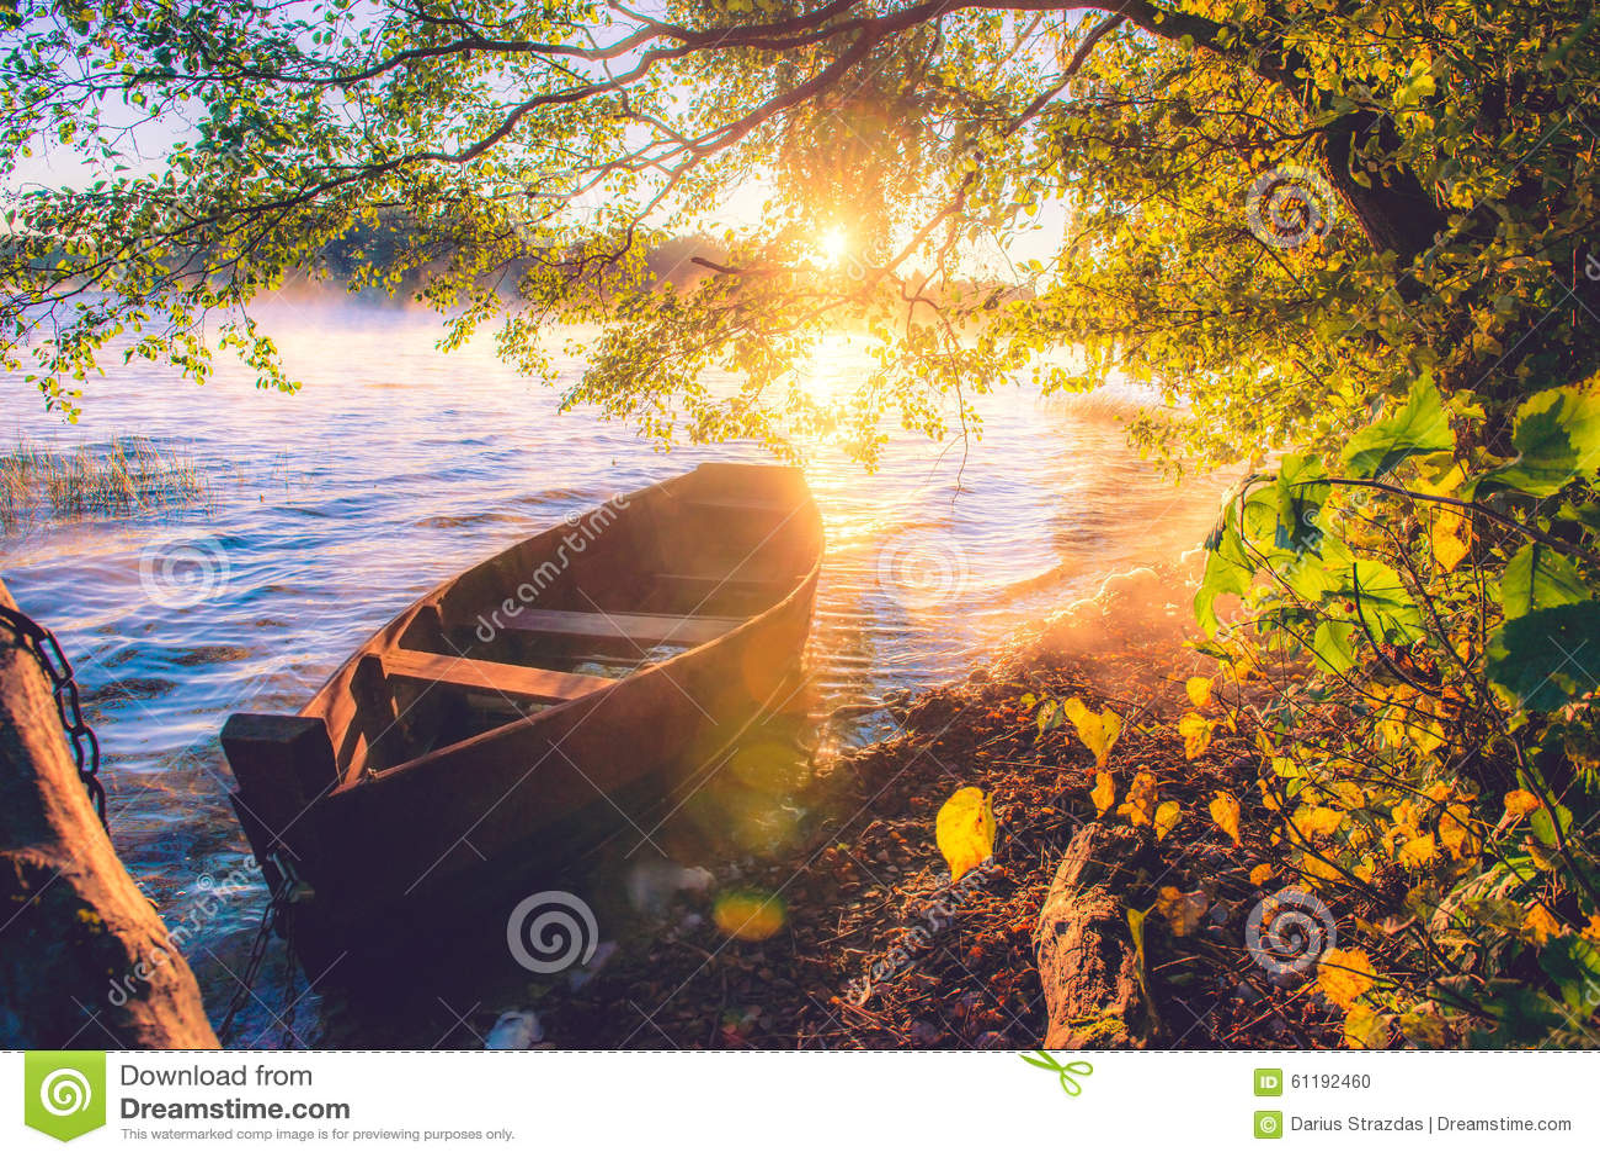 Boat in lake, sunrise stock photo. Image of boat, float - 61192460